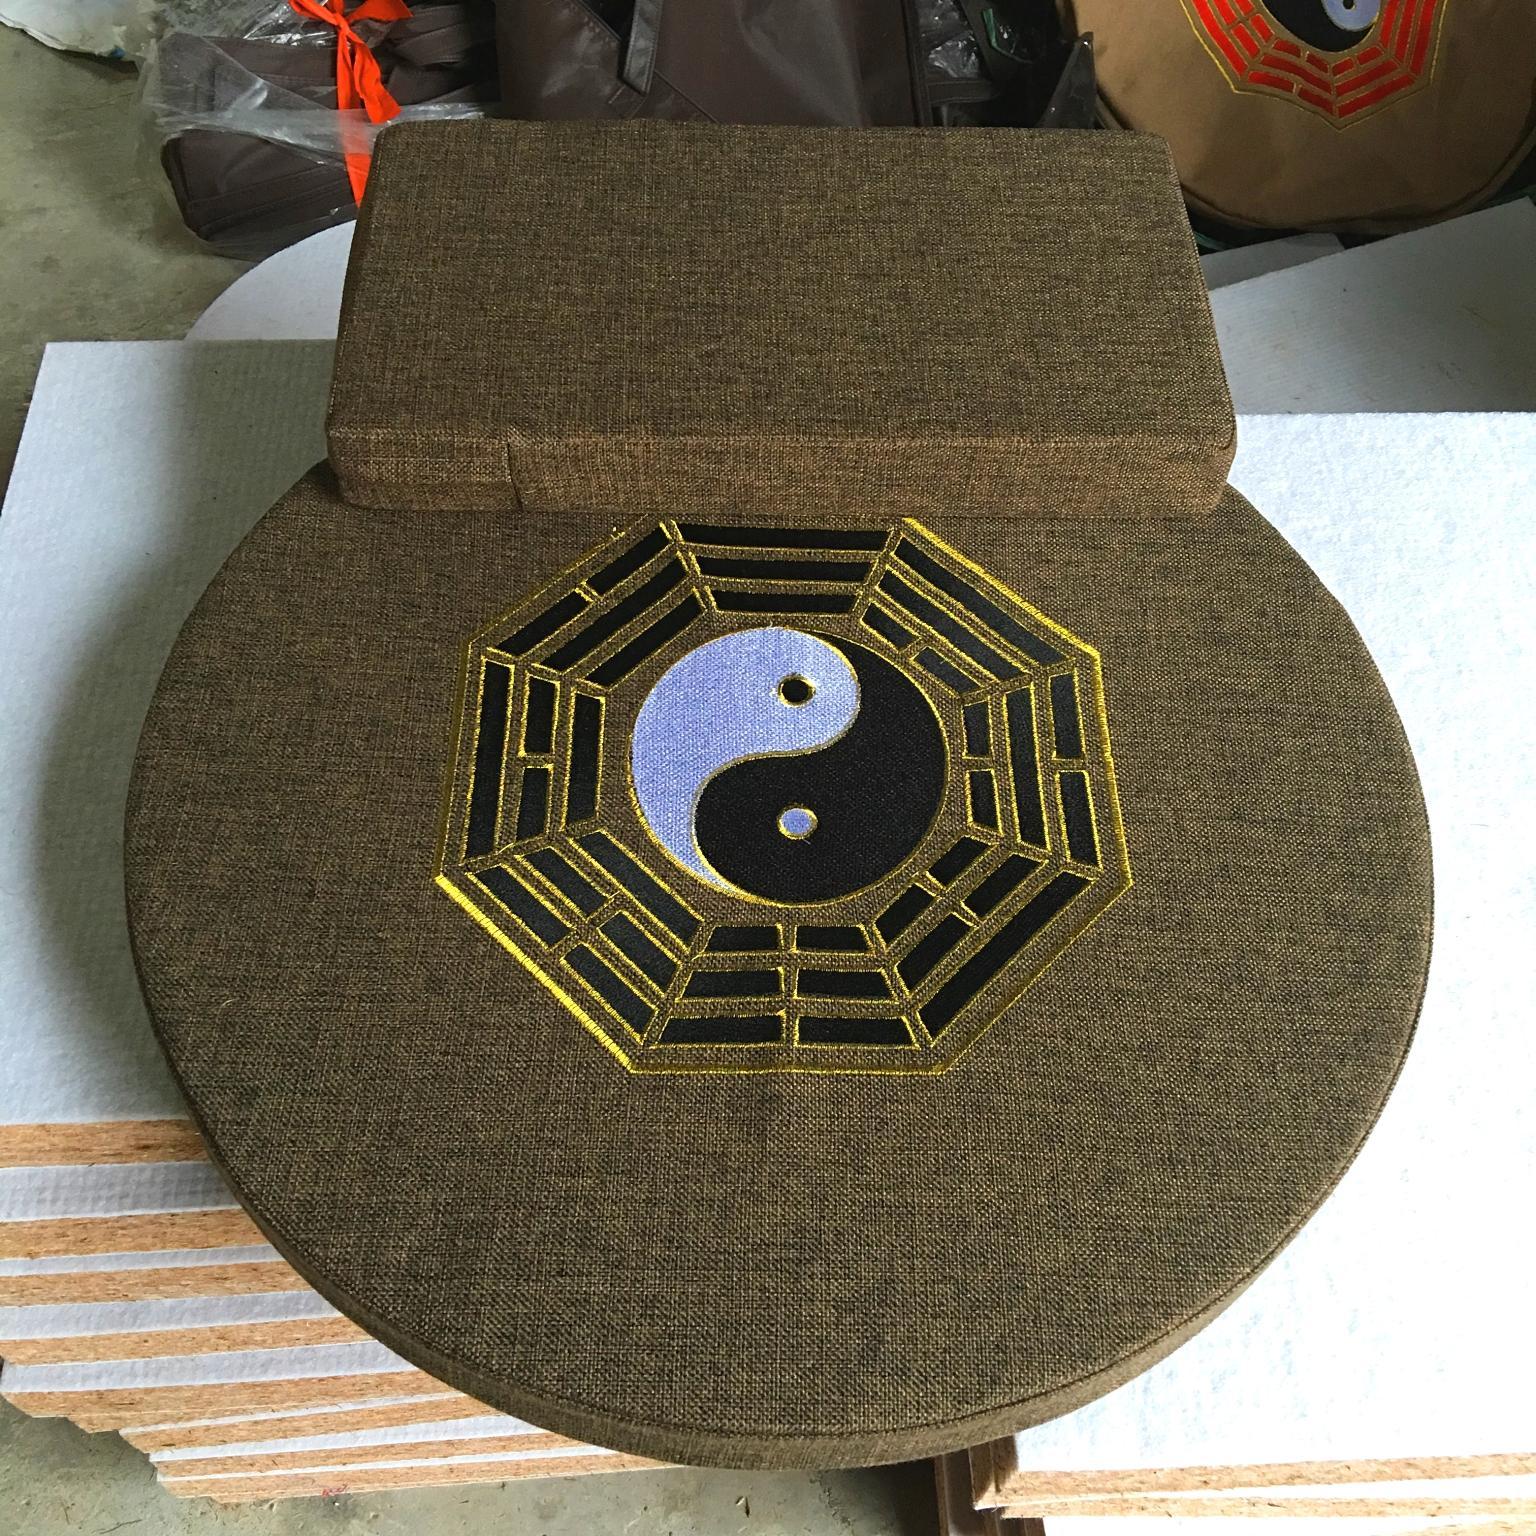 Meditation round ye zong si embroidered cushion da zuo dian